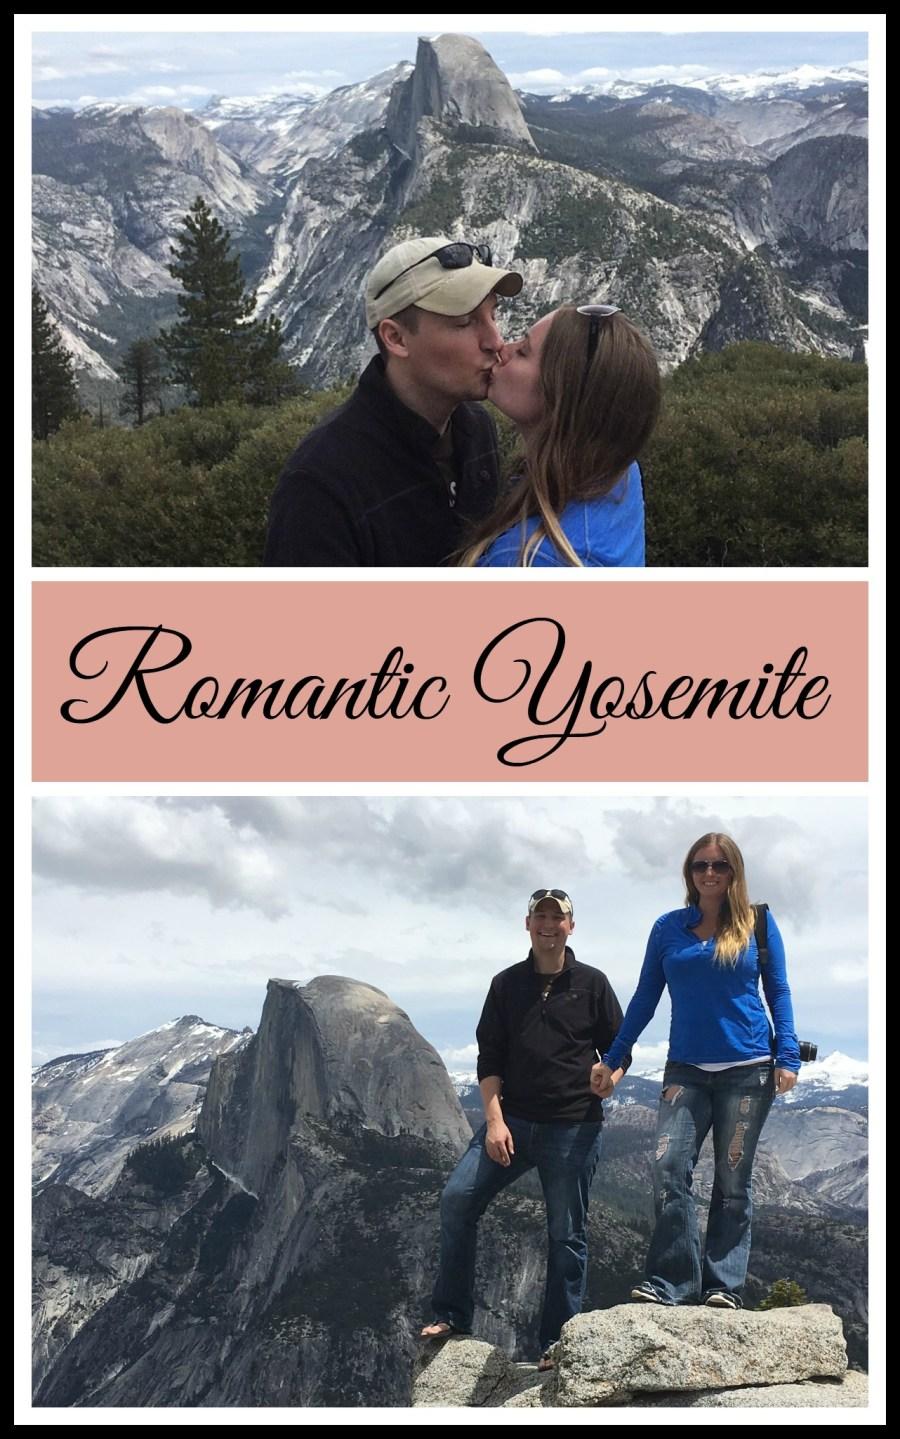 Romantic Yosemite